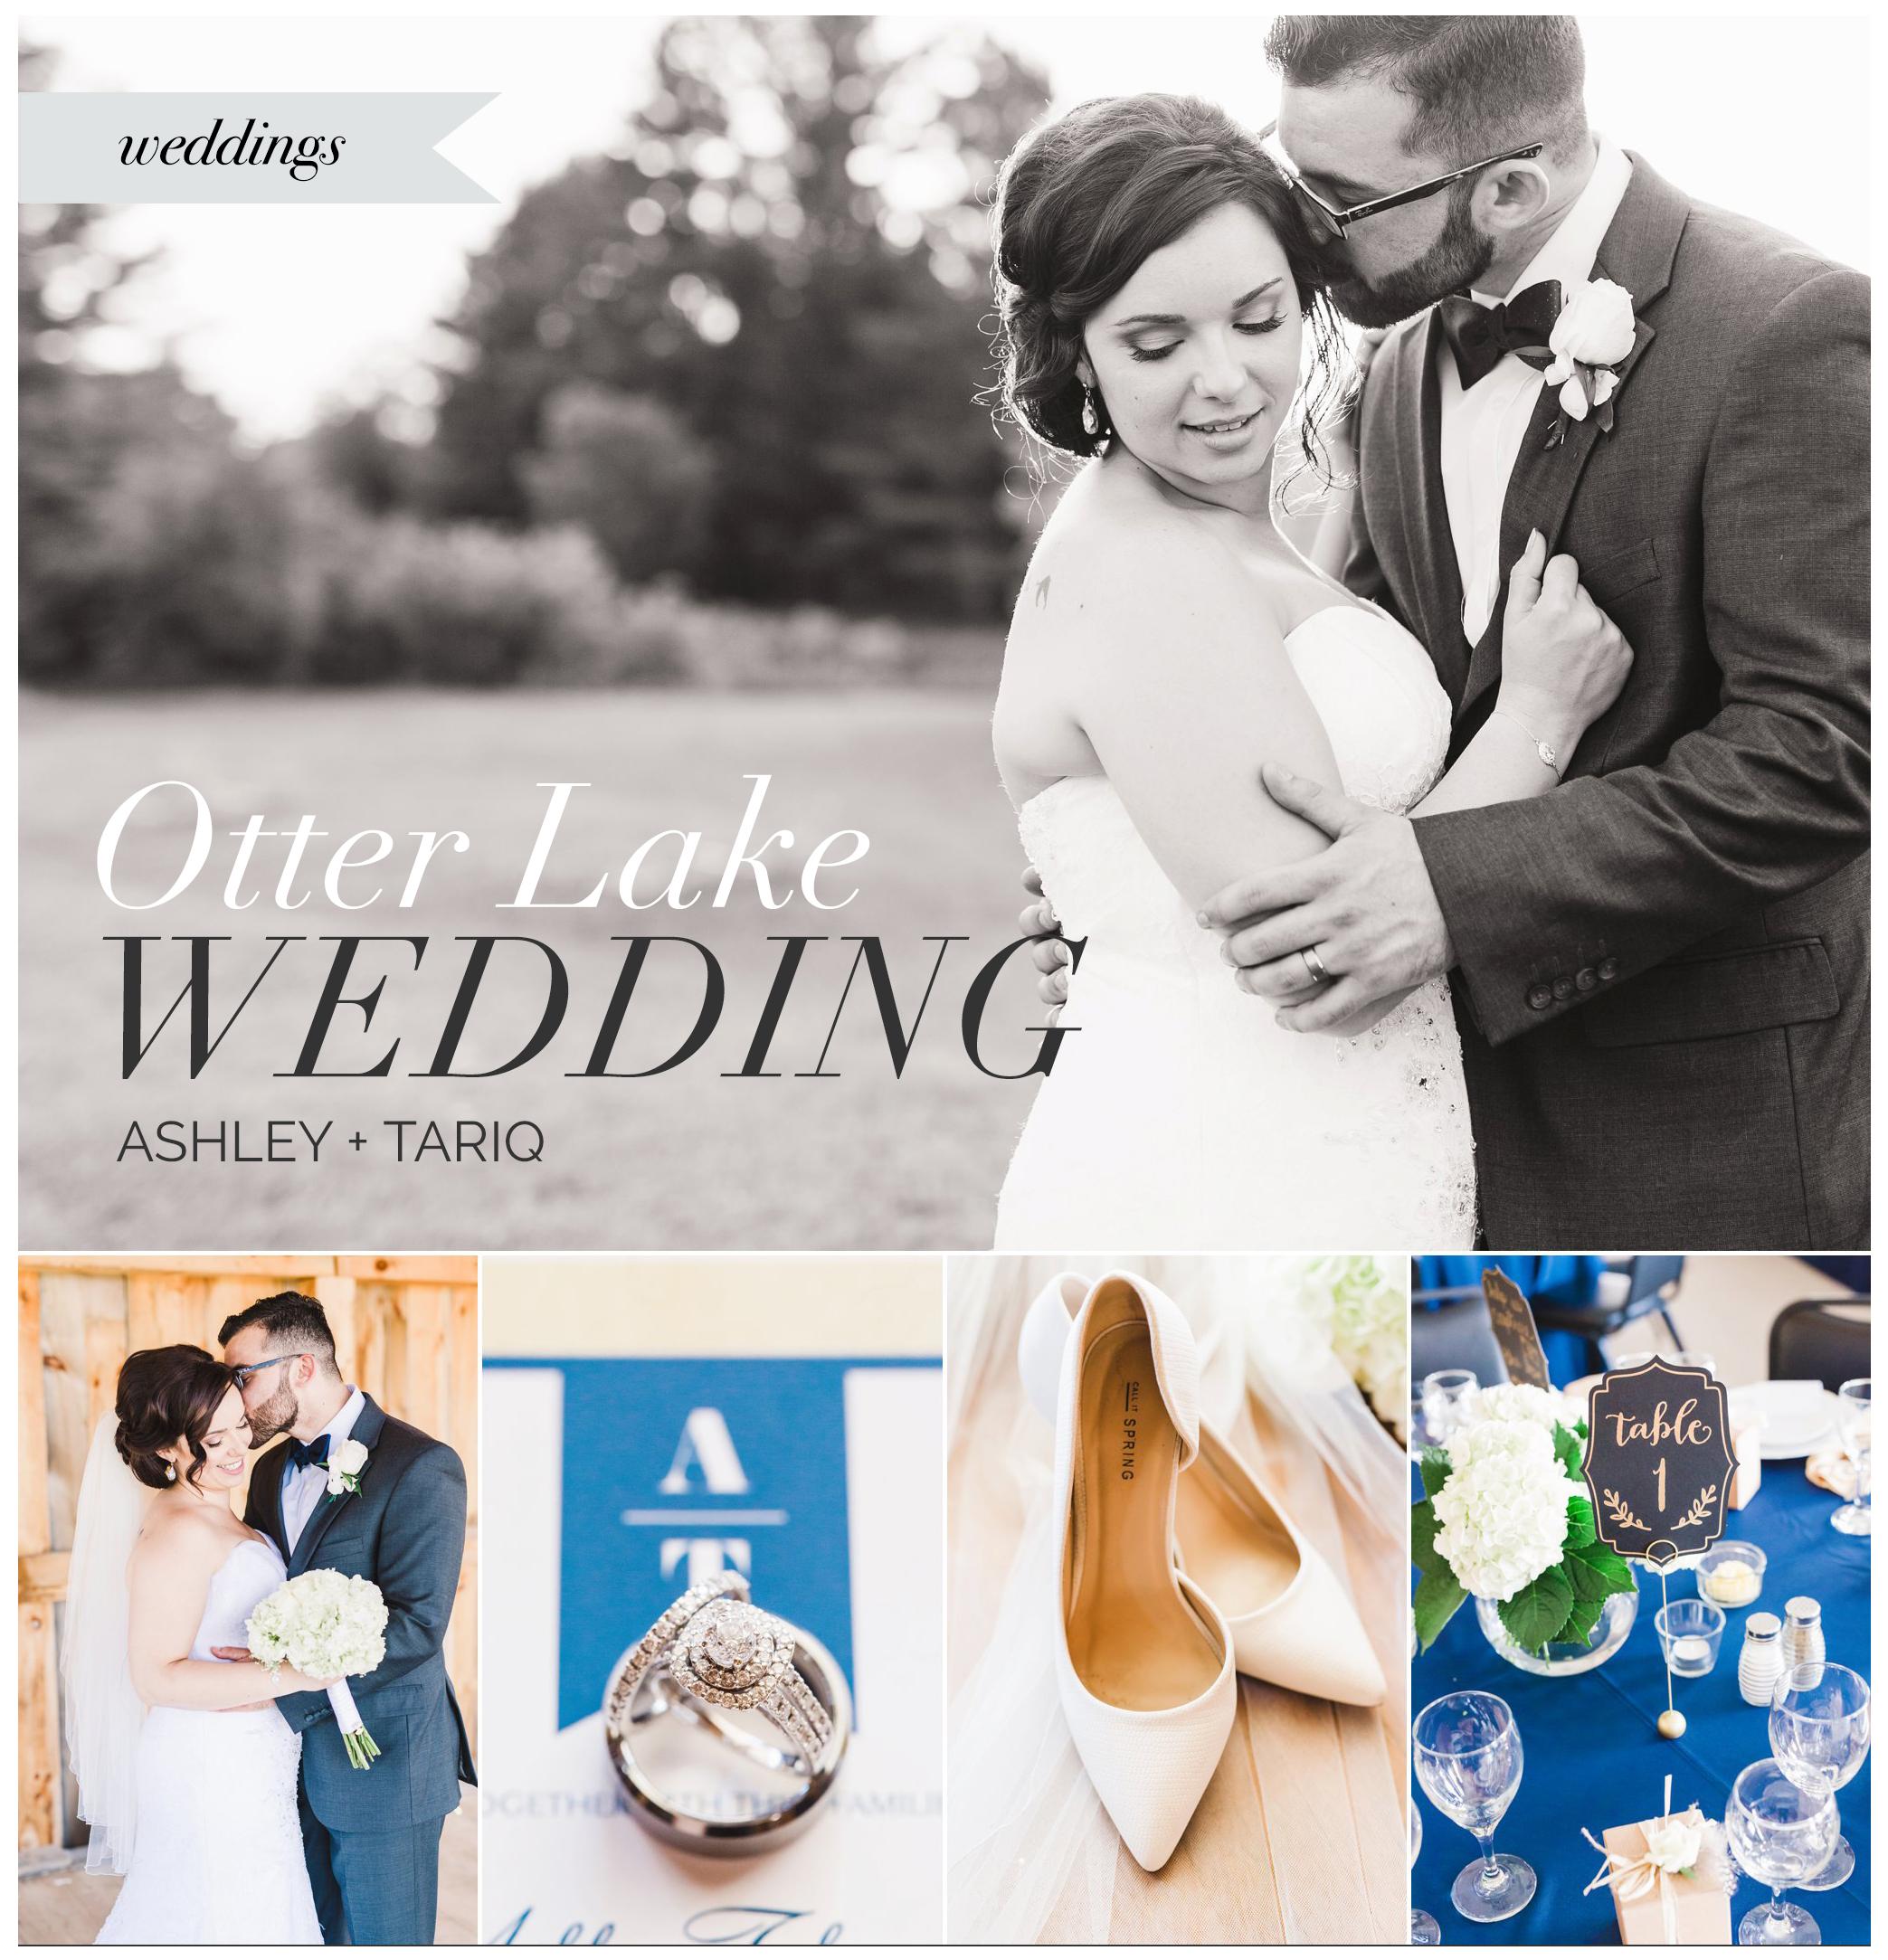 amy-sturgeon-photography_otter-lake-wedding_header_001